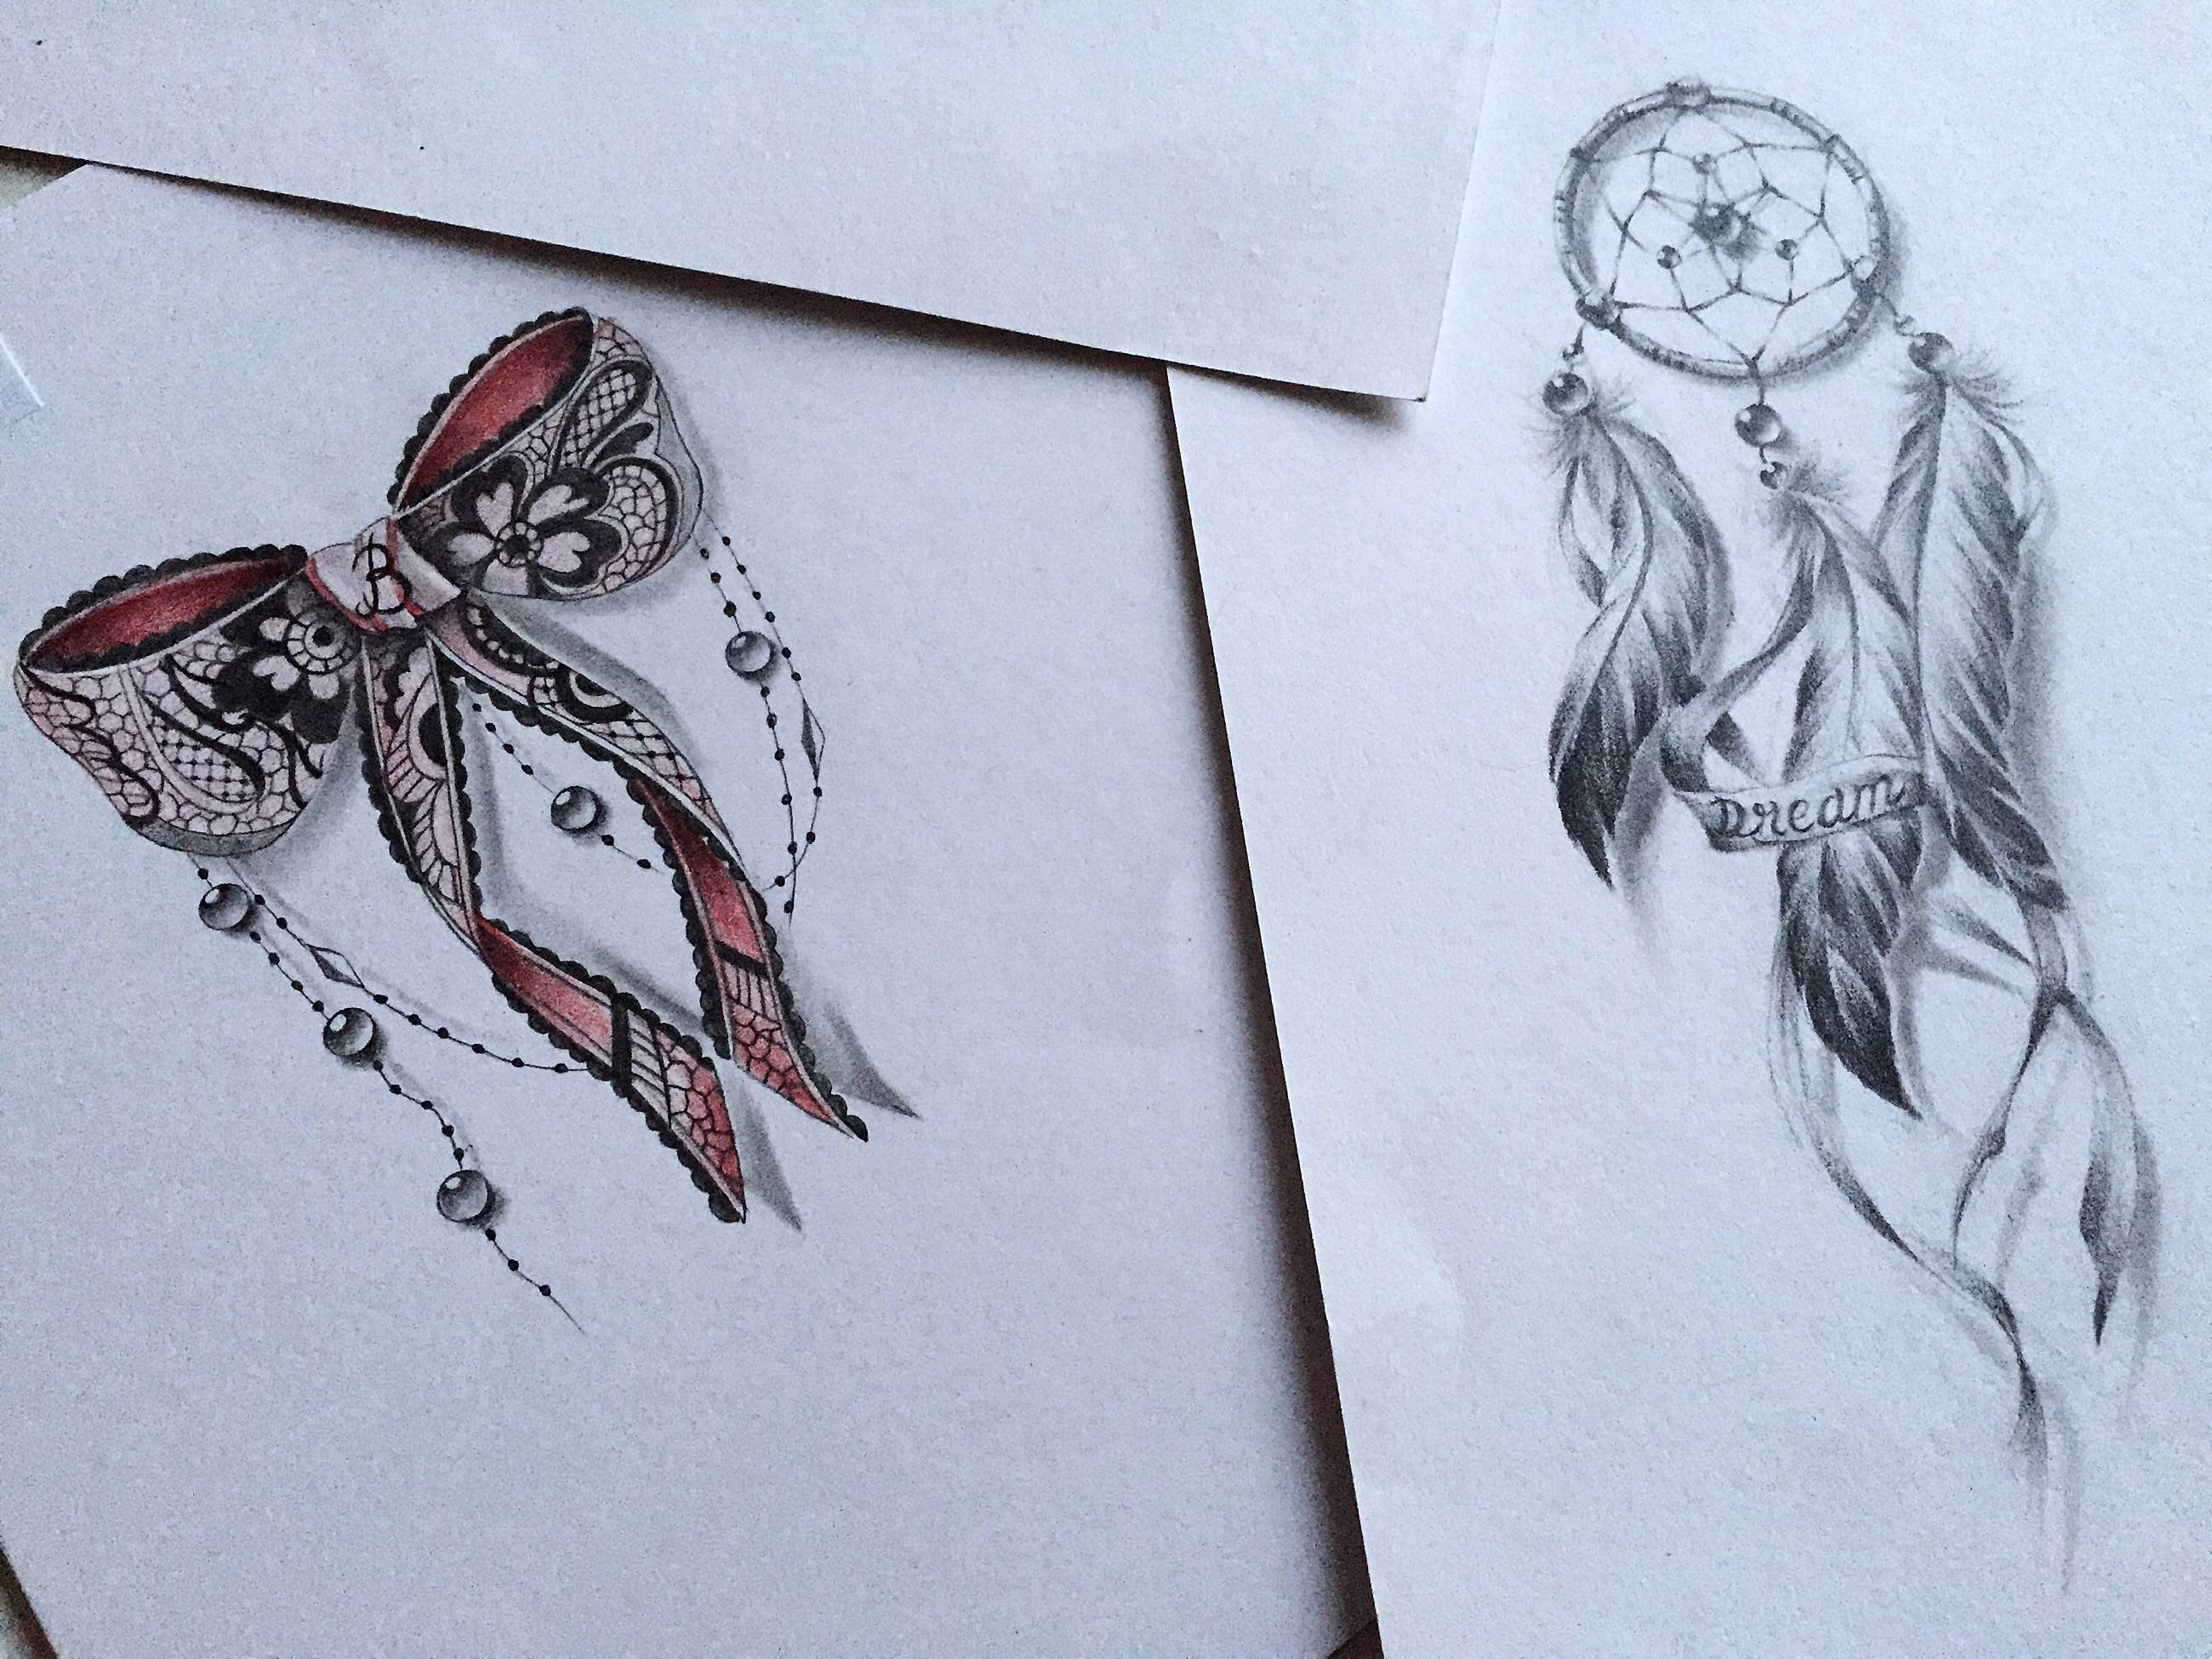 Noeud Maingriz Tattoo Design